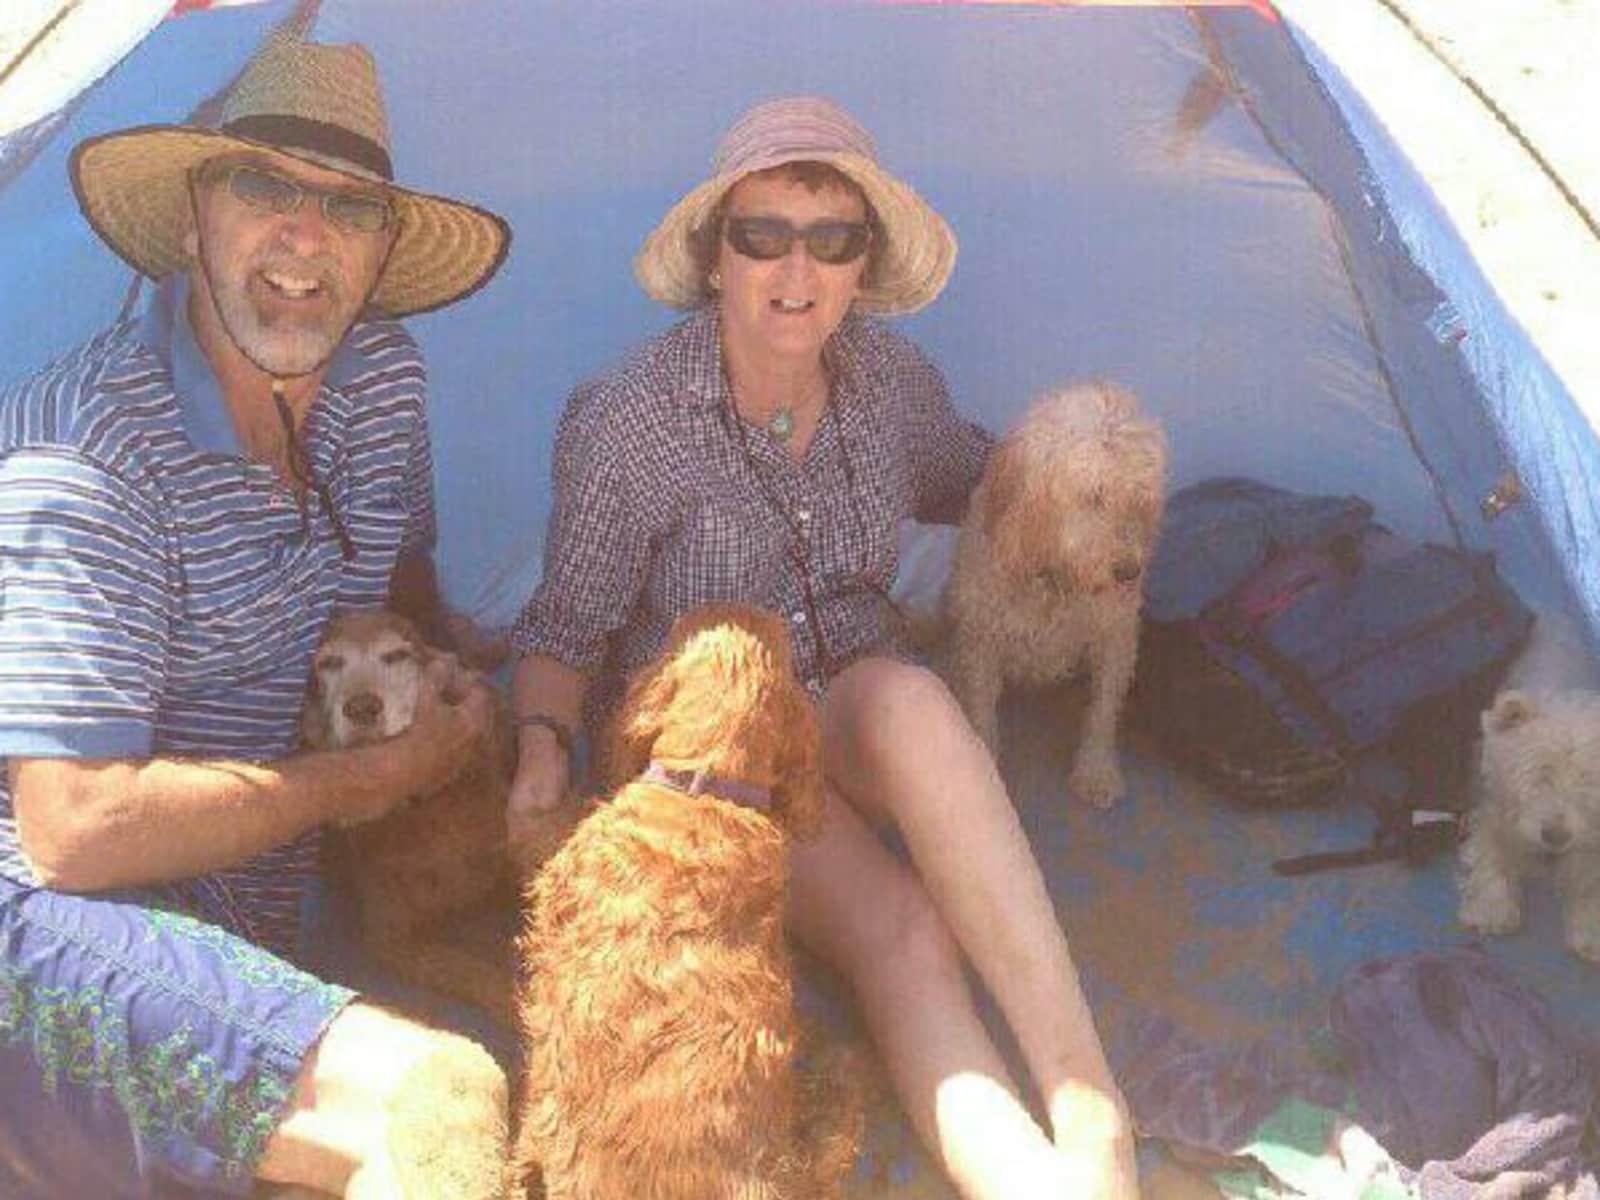 Carmel & Neil from Strathfieldsaye, Victoria, Australia